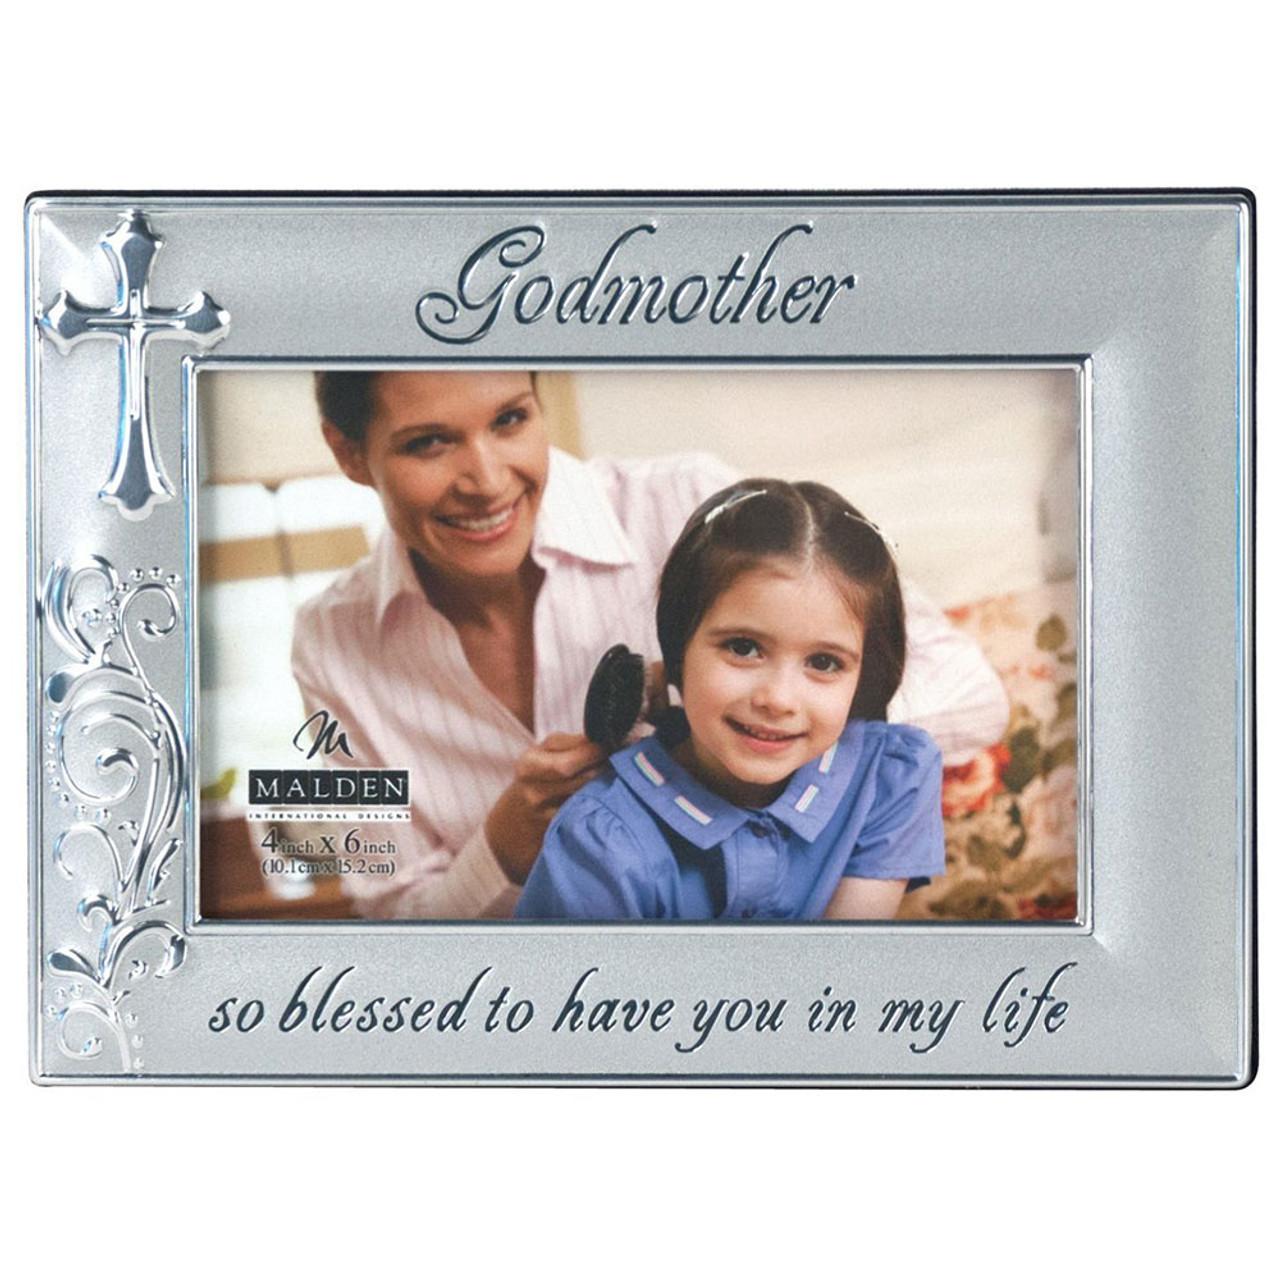 Godmother Two Tone Silver Frame w/Cross 4x6